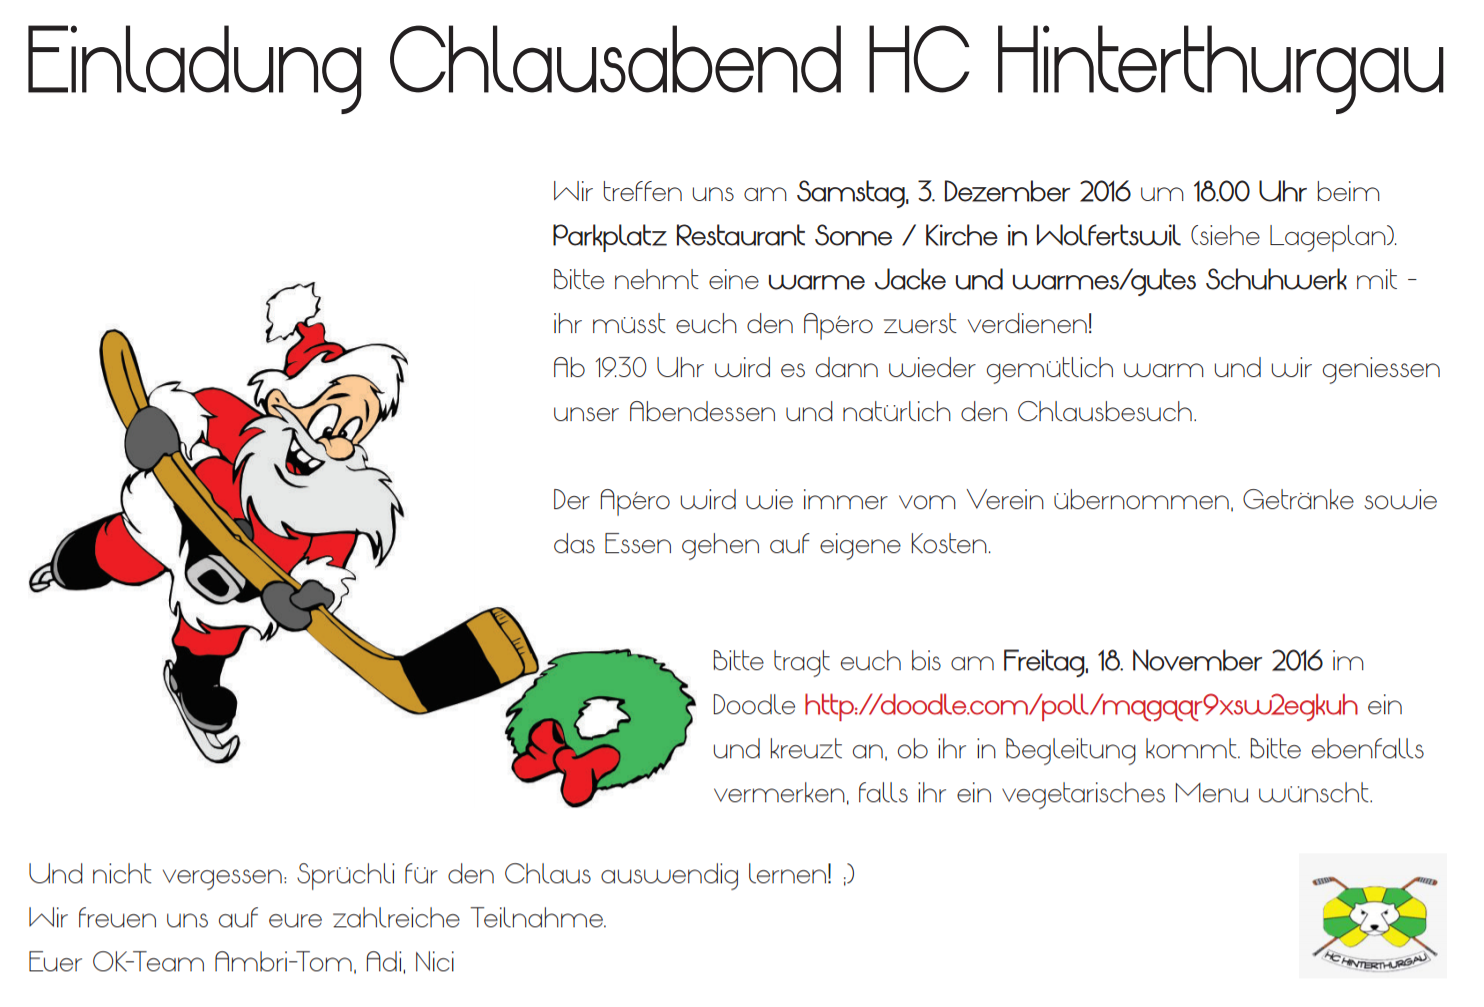 HC Hinterthurgau